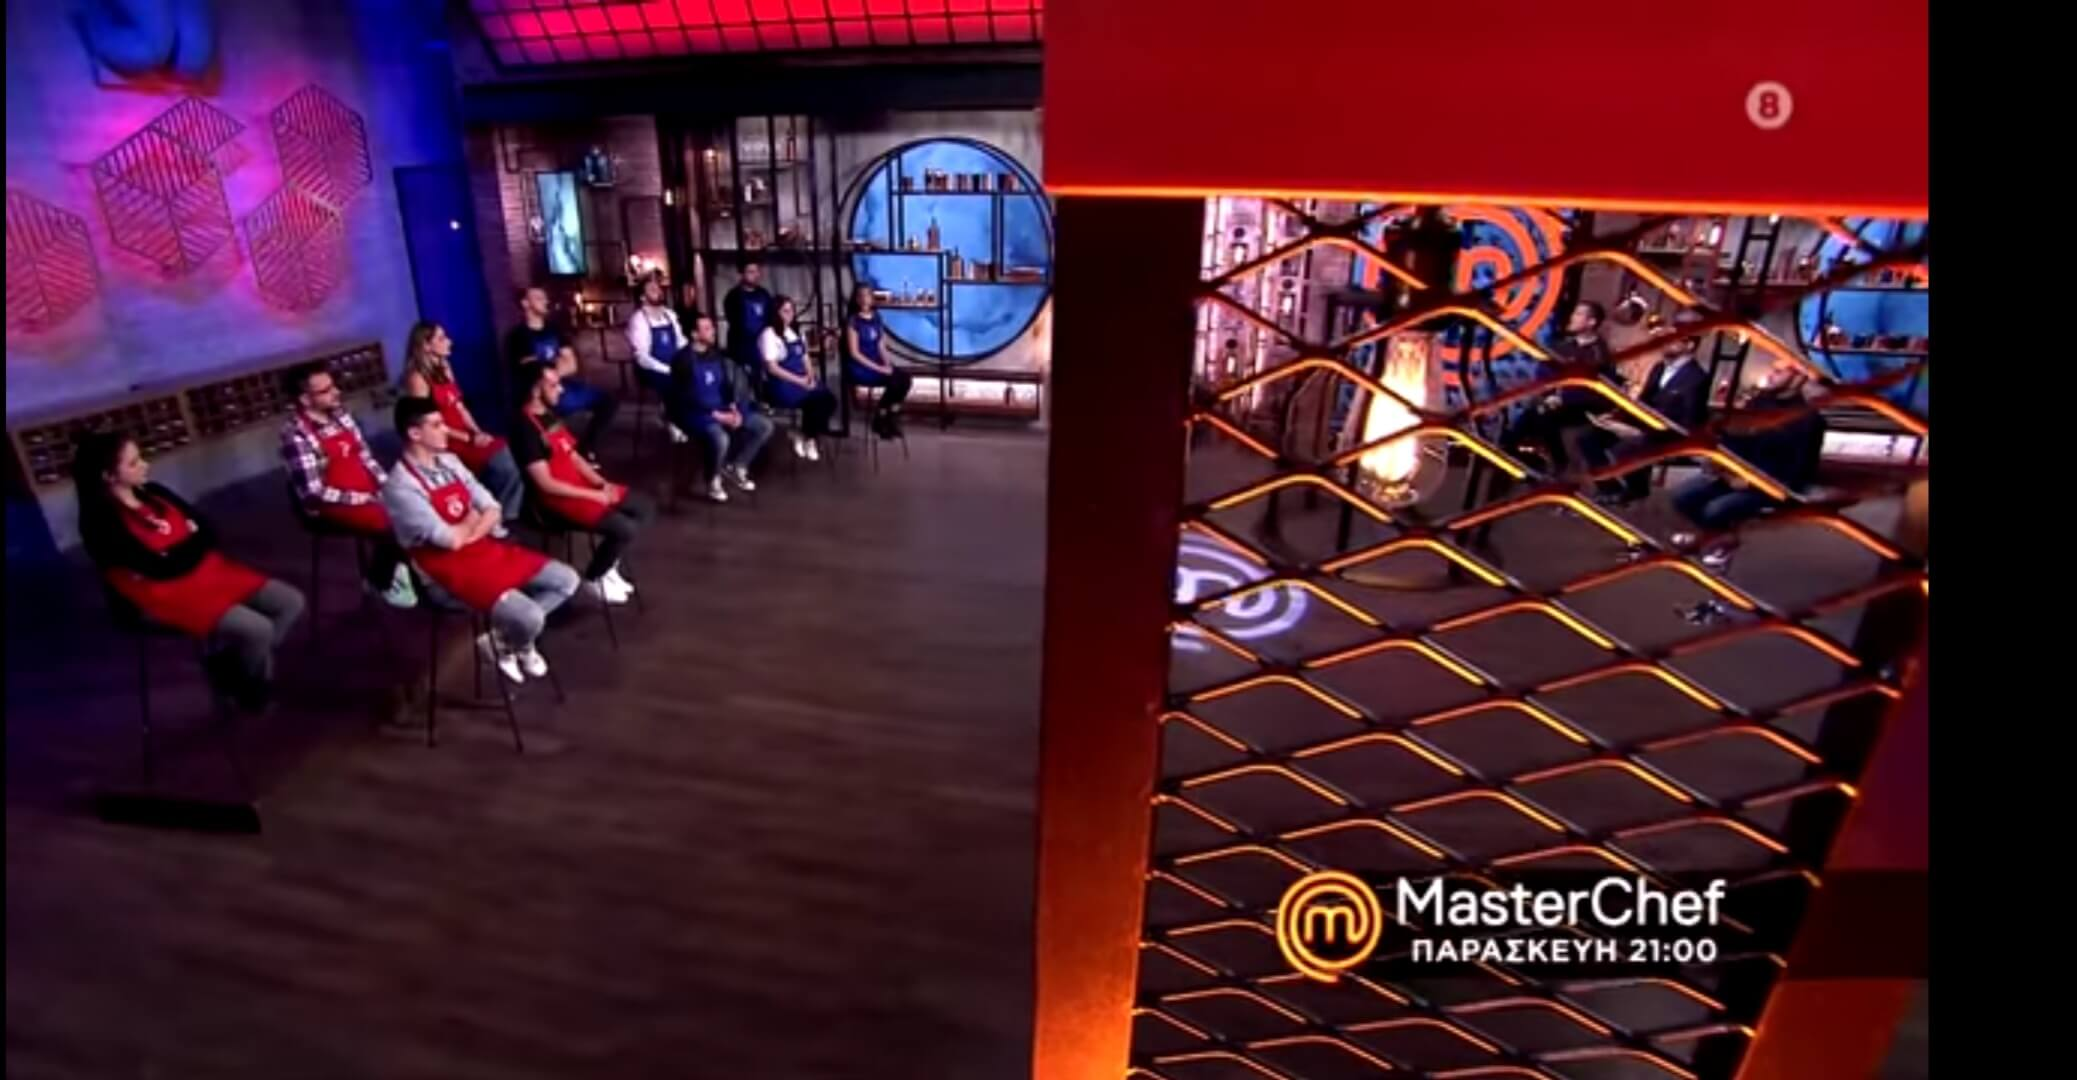 Masterchef-spoiler: Ποιοί κερδίζουν στην ομαδική δοκιμασία